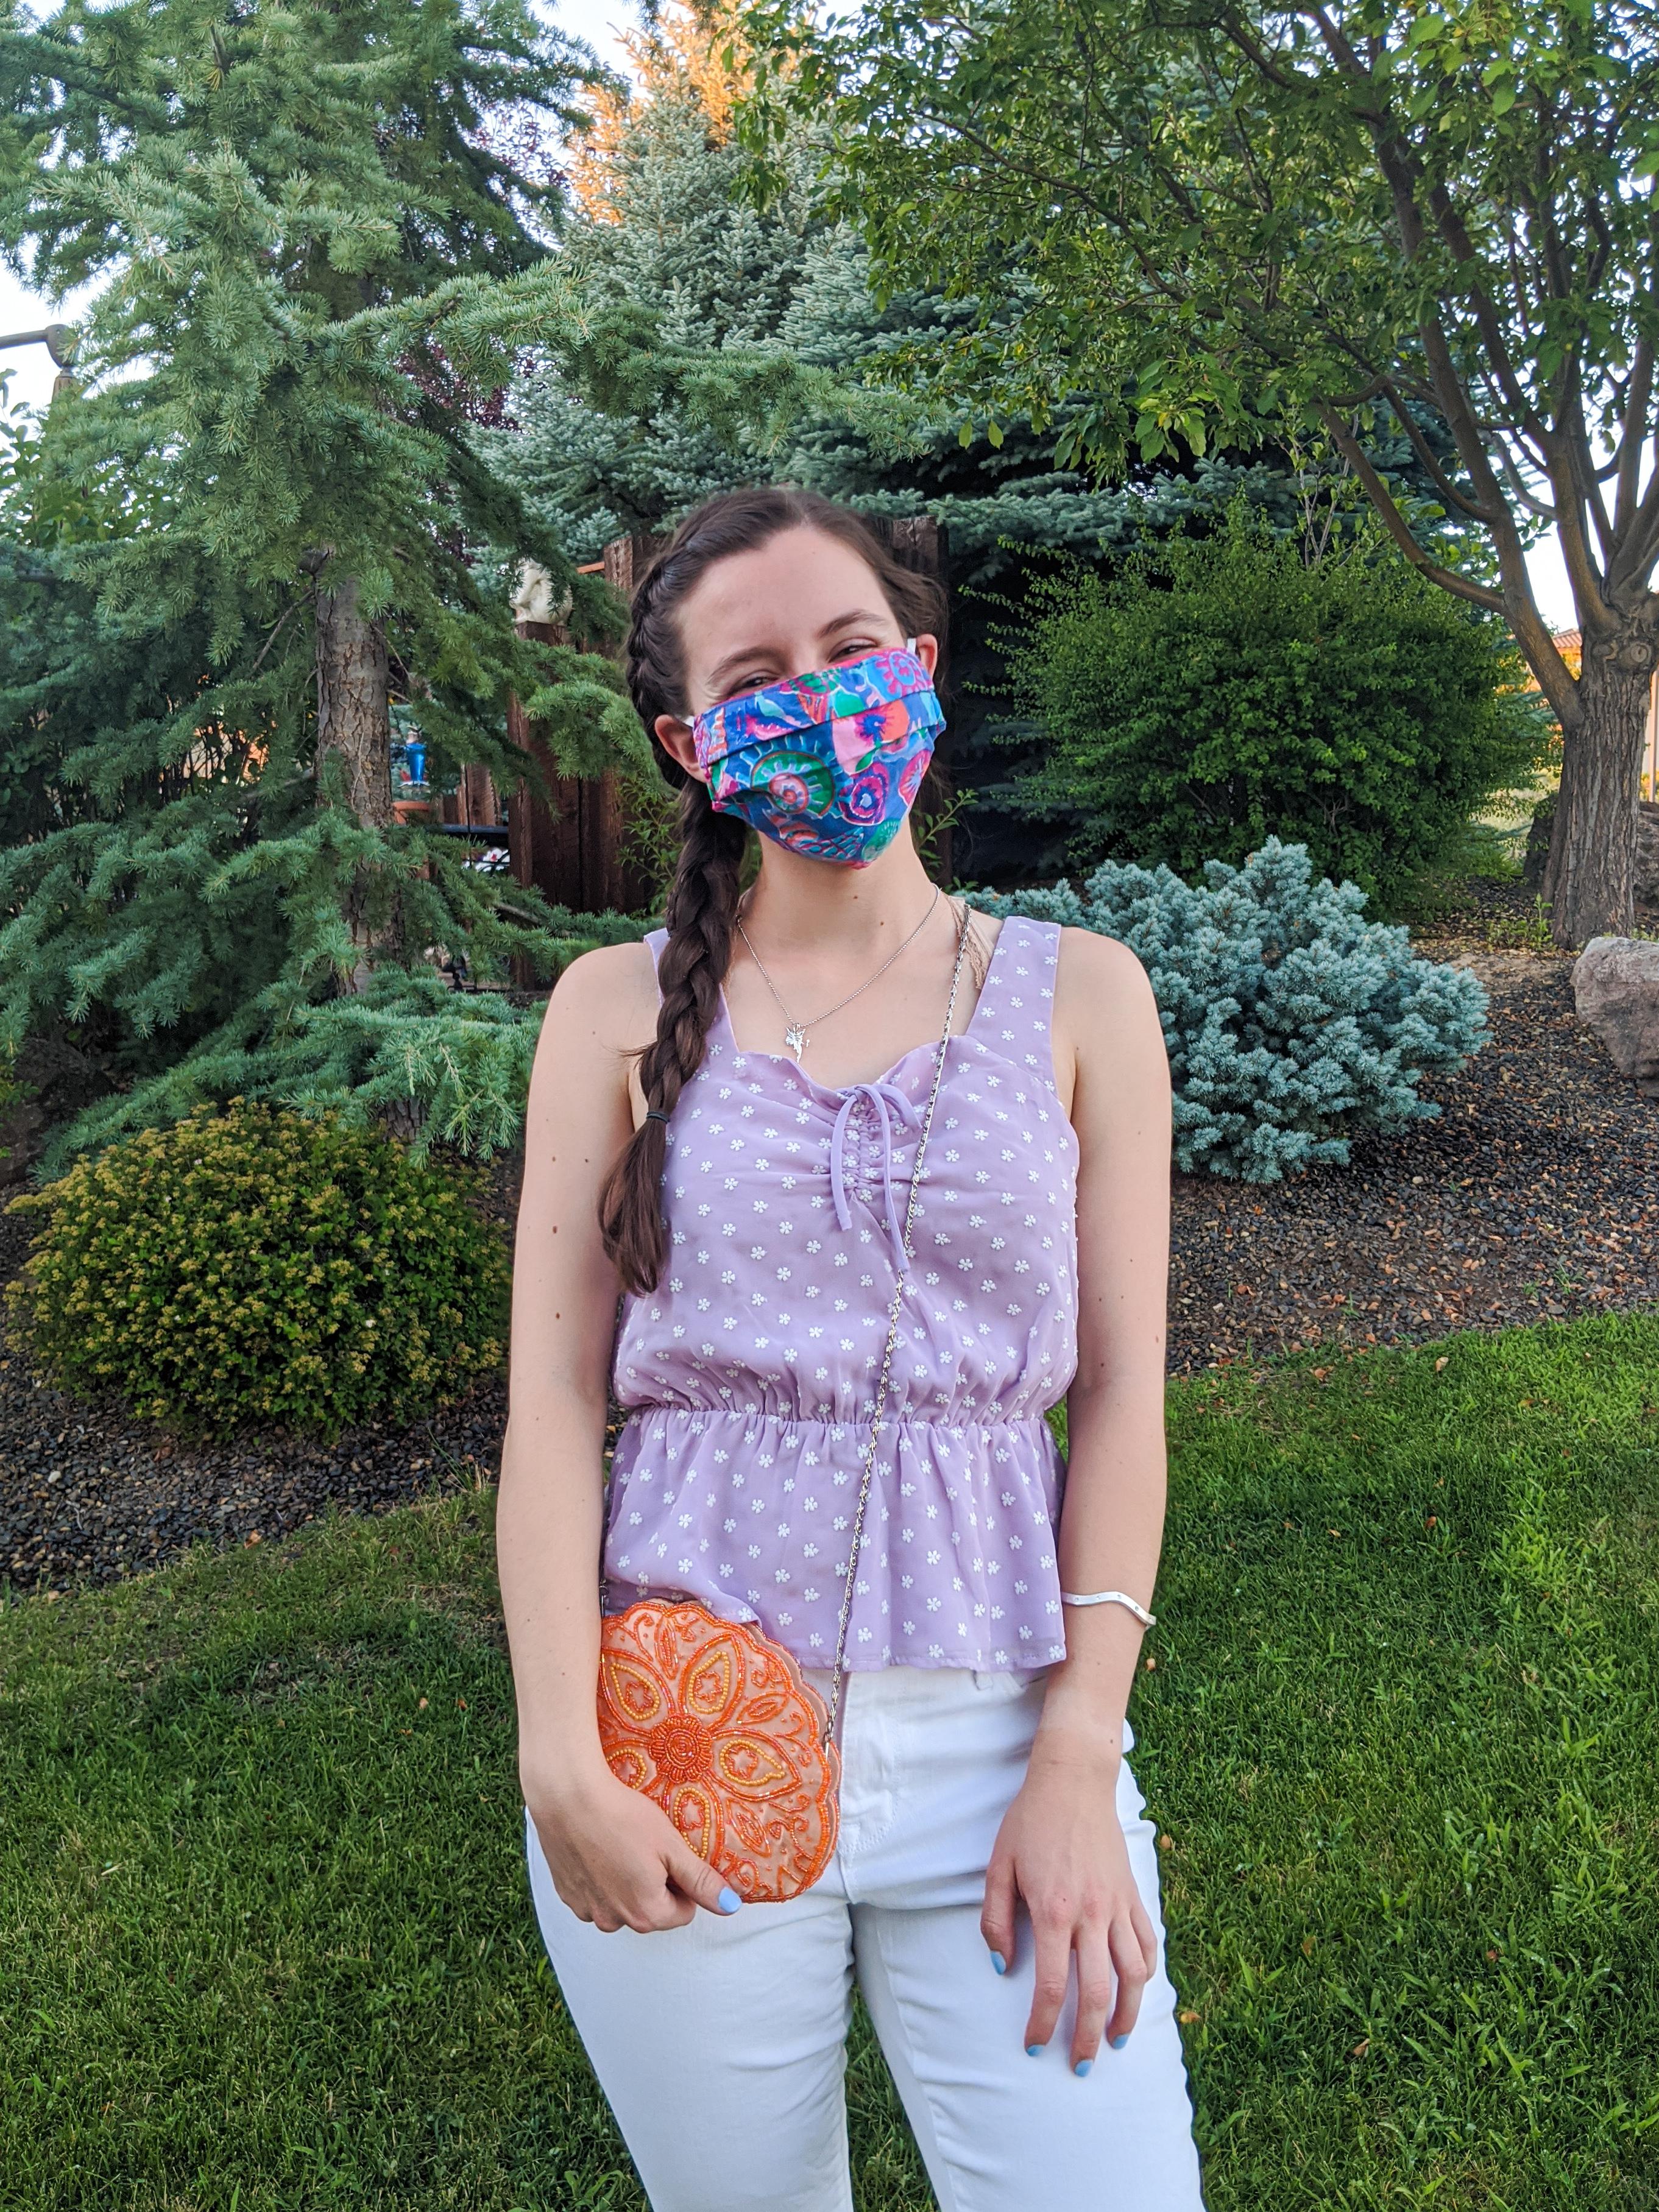 lavender-top-orange-purse-colorful-face-mask